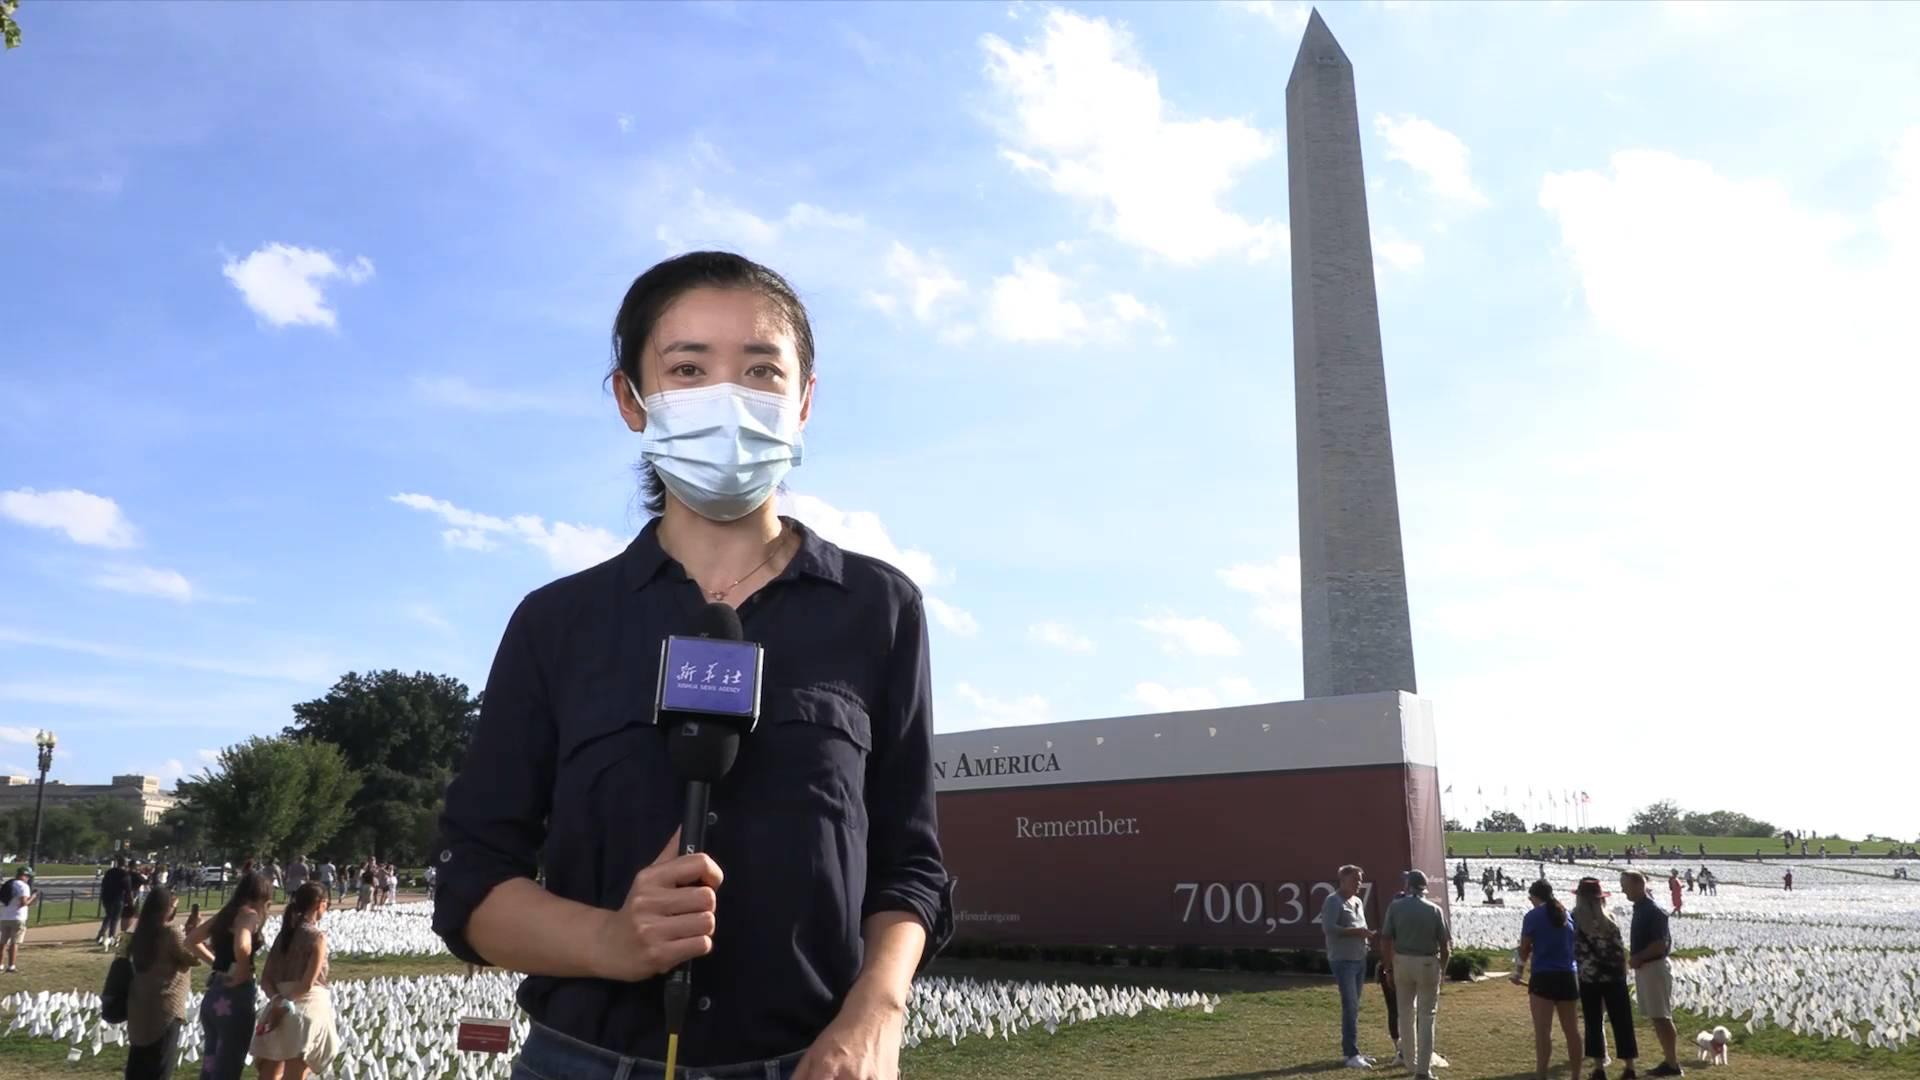 GLOBALink   U.S. COVID-19 death toll exceeds 700,000